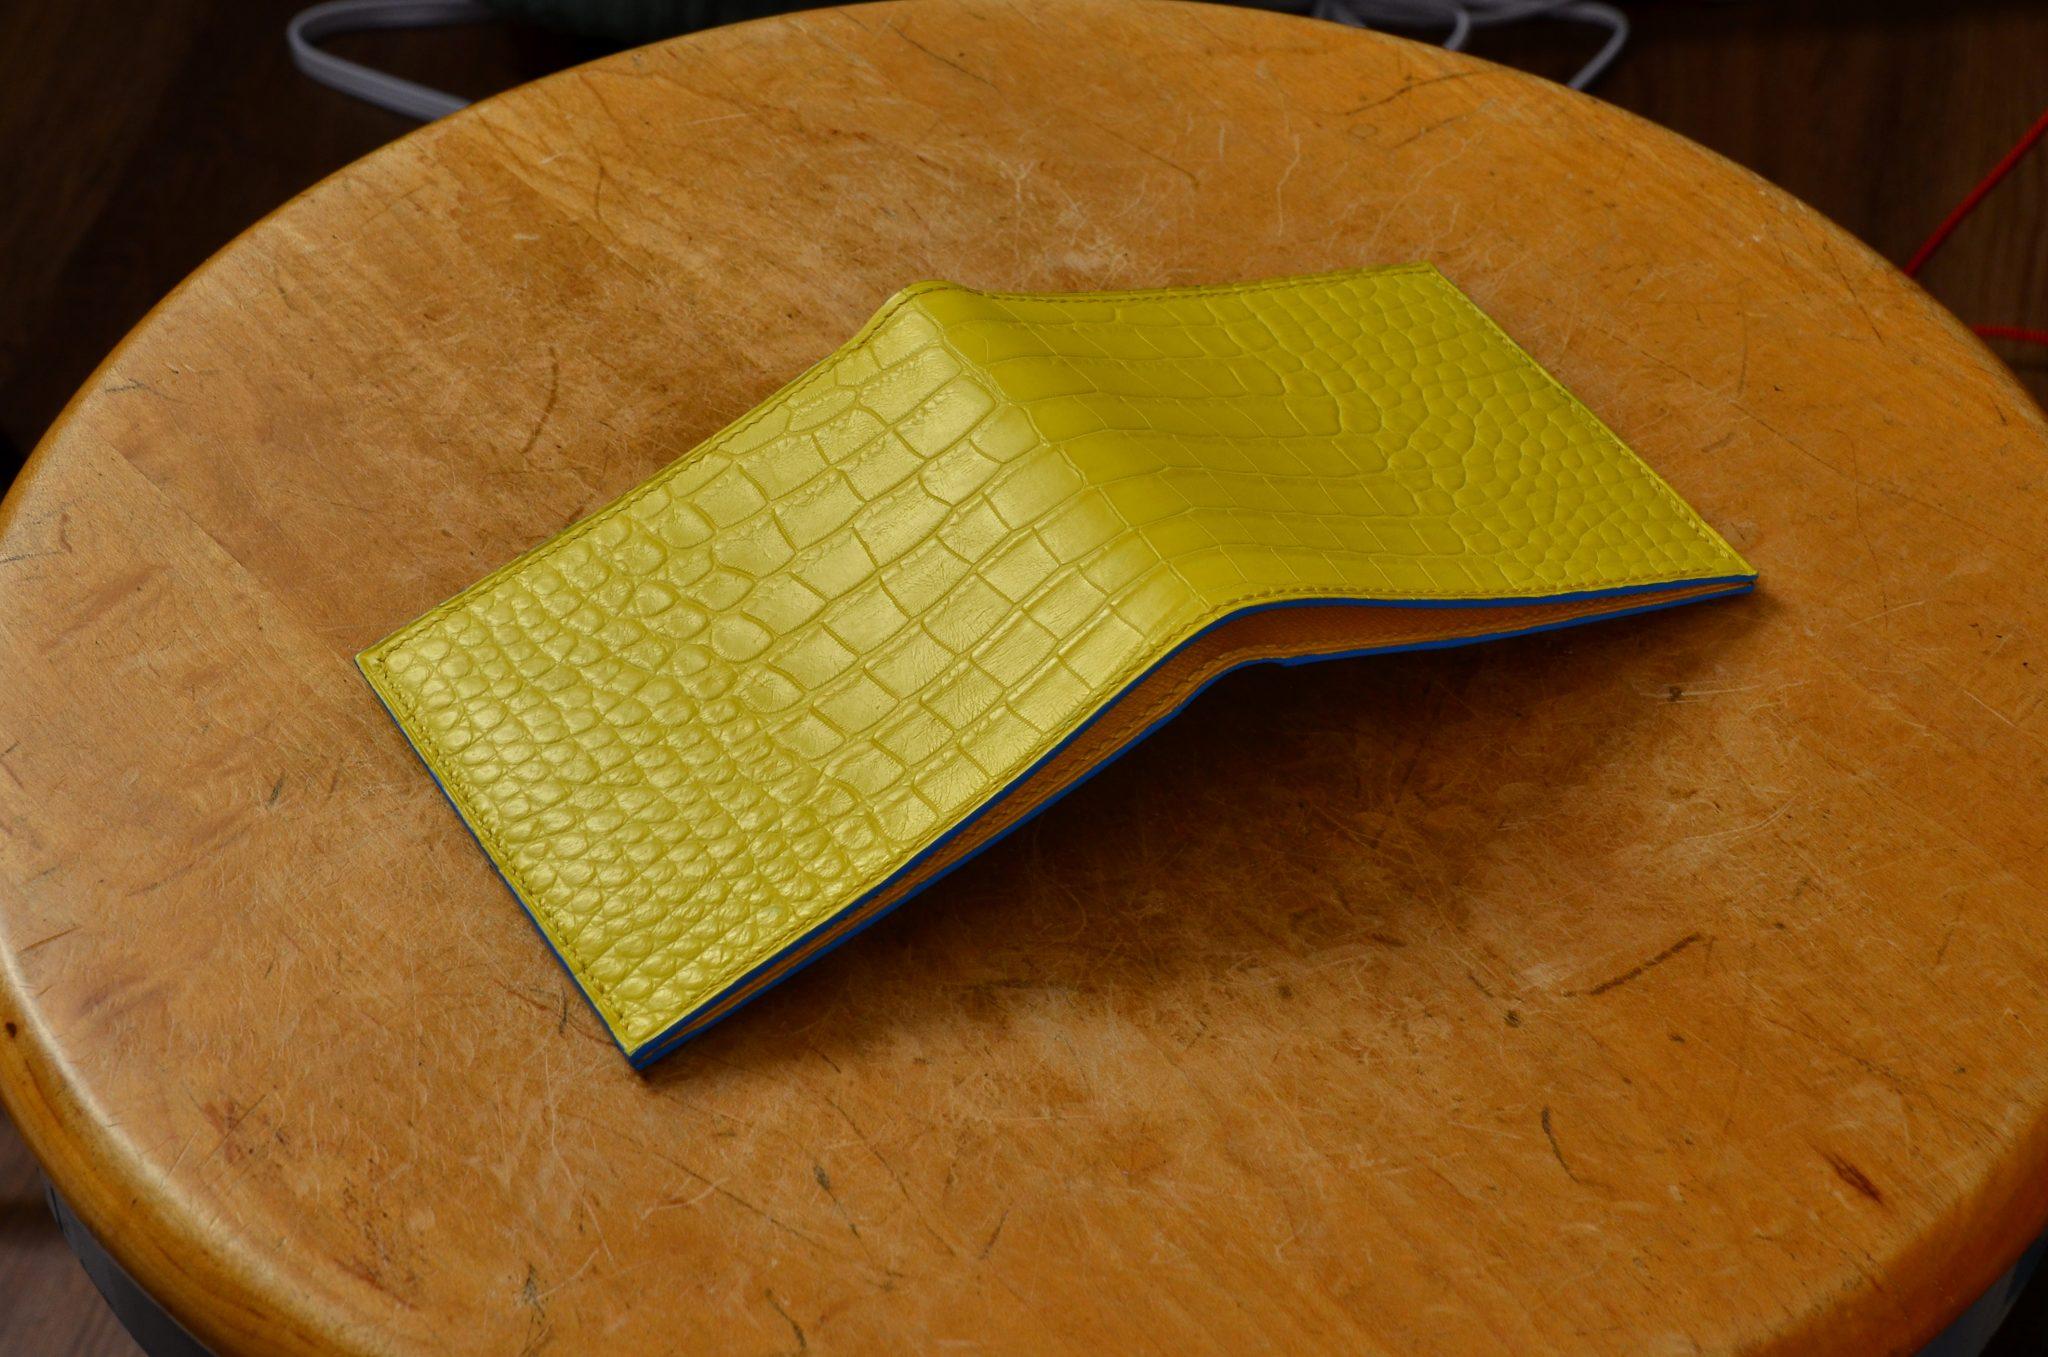 Yellow Alligator Wallet